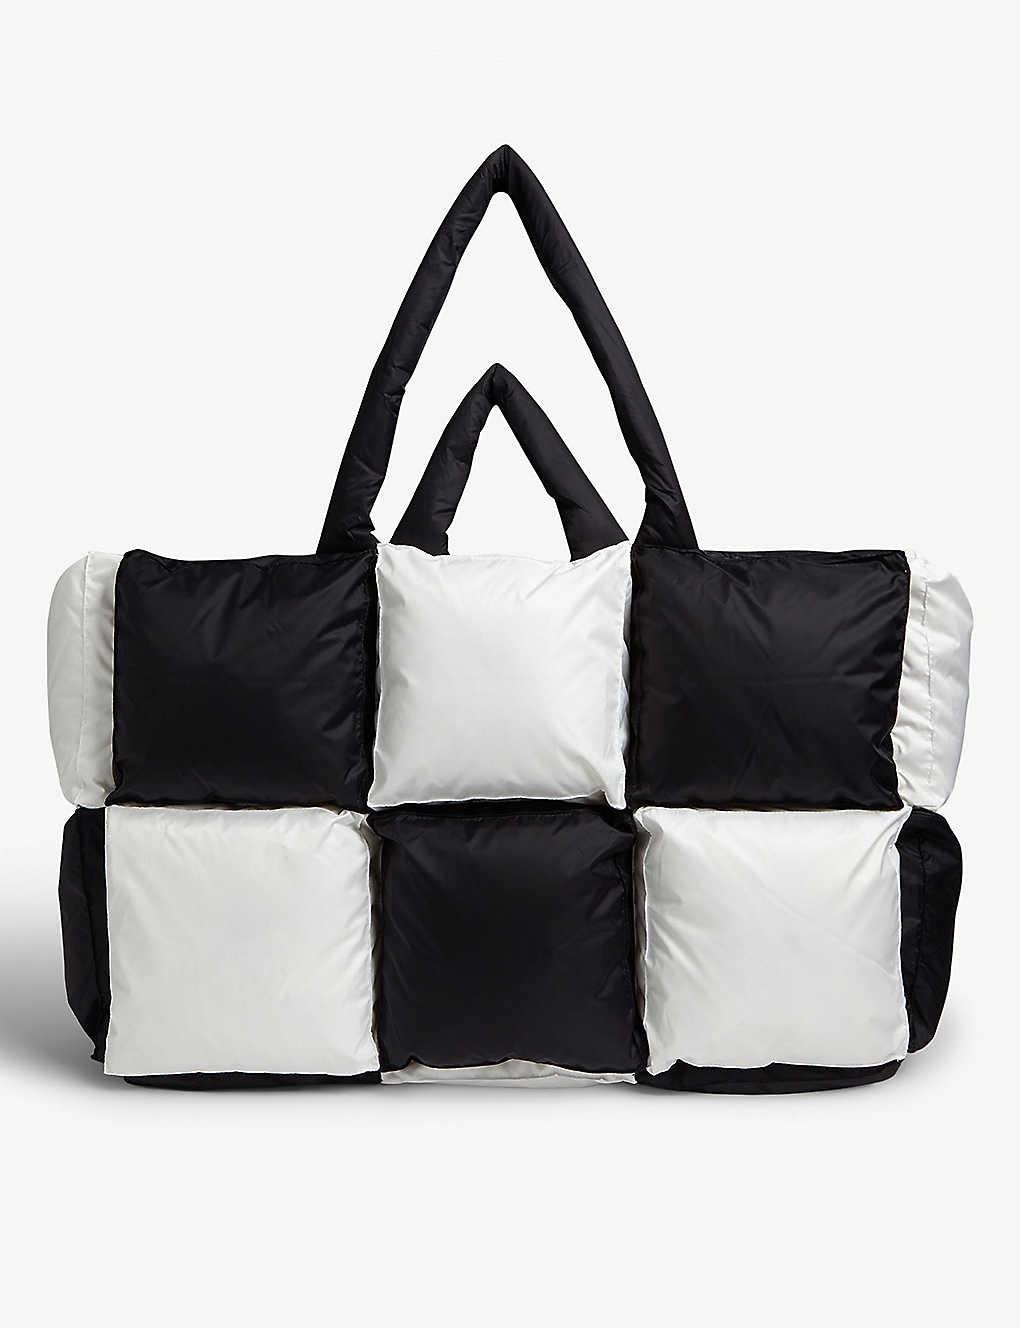 off-white puffer bag